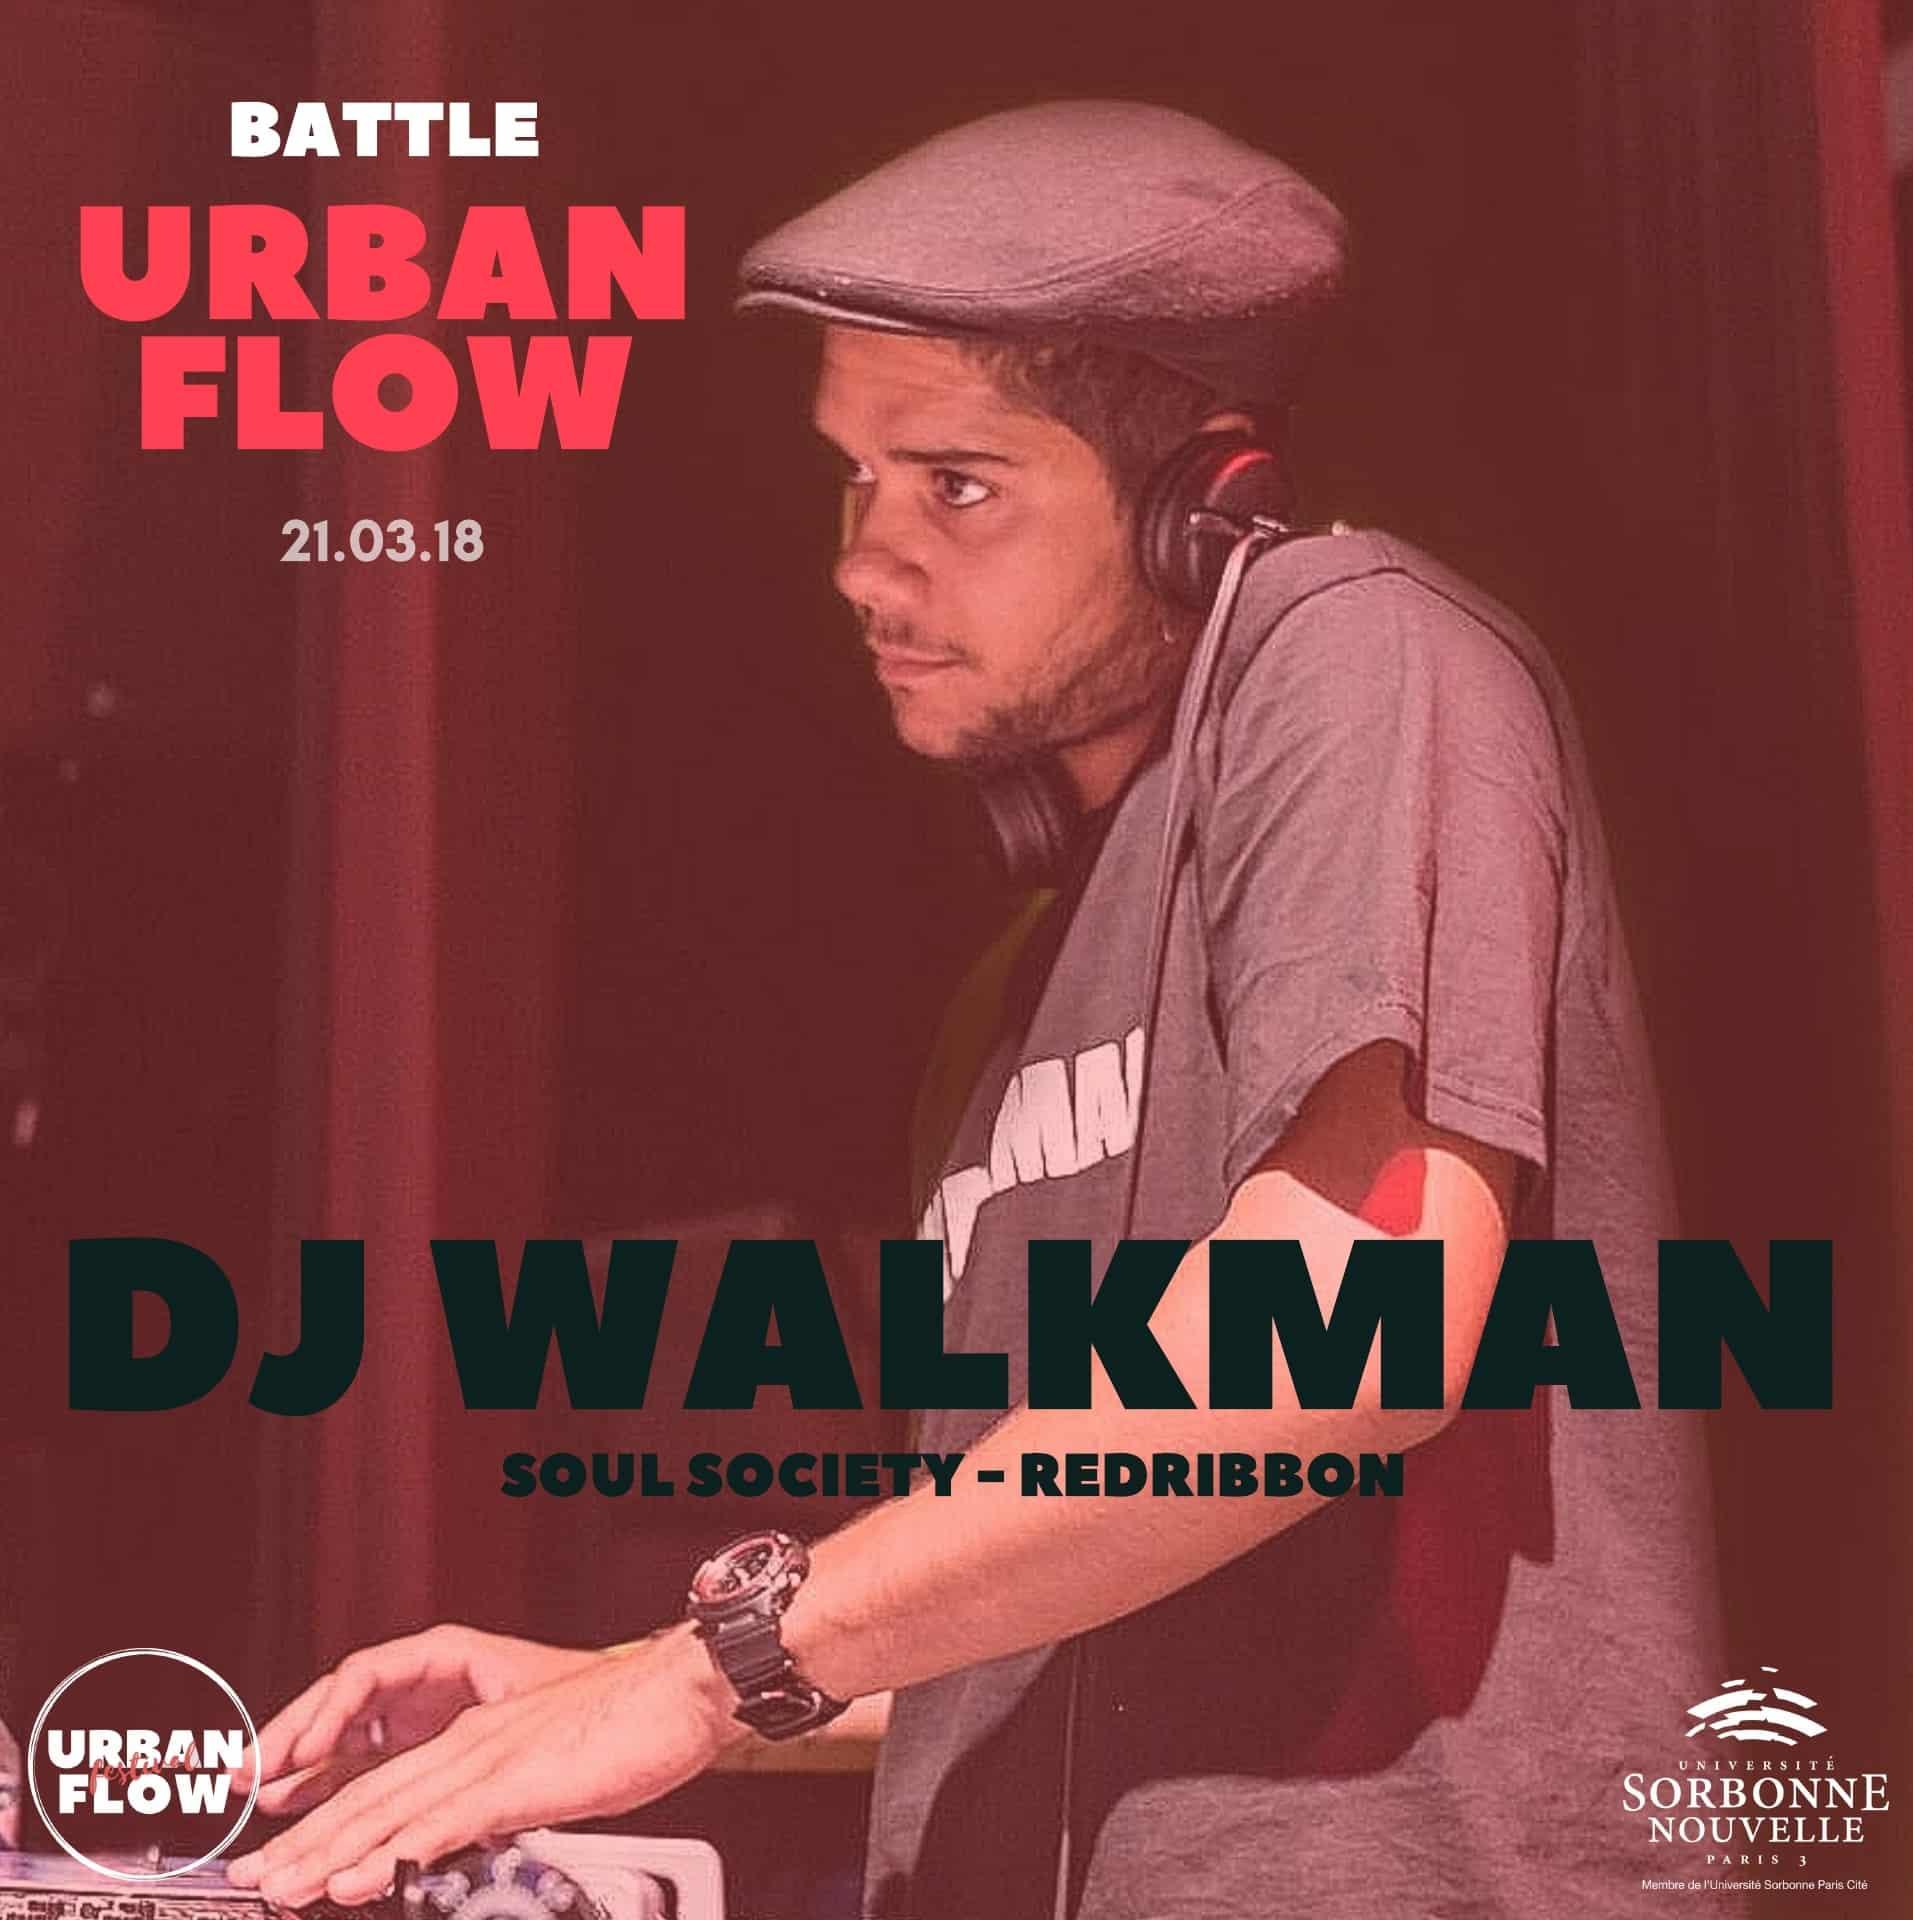 image o walkman dj